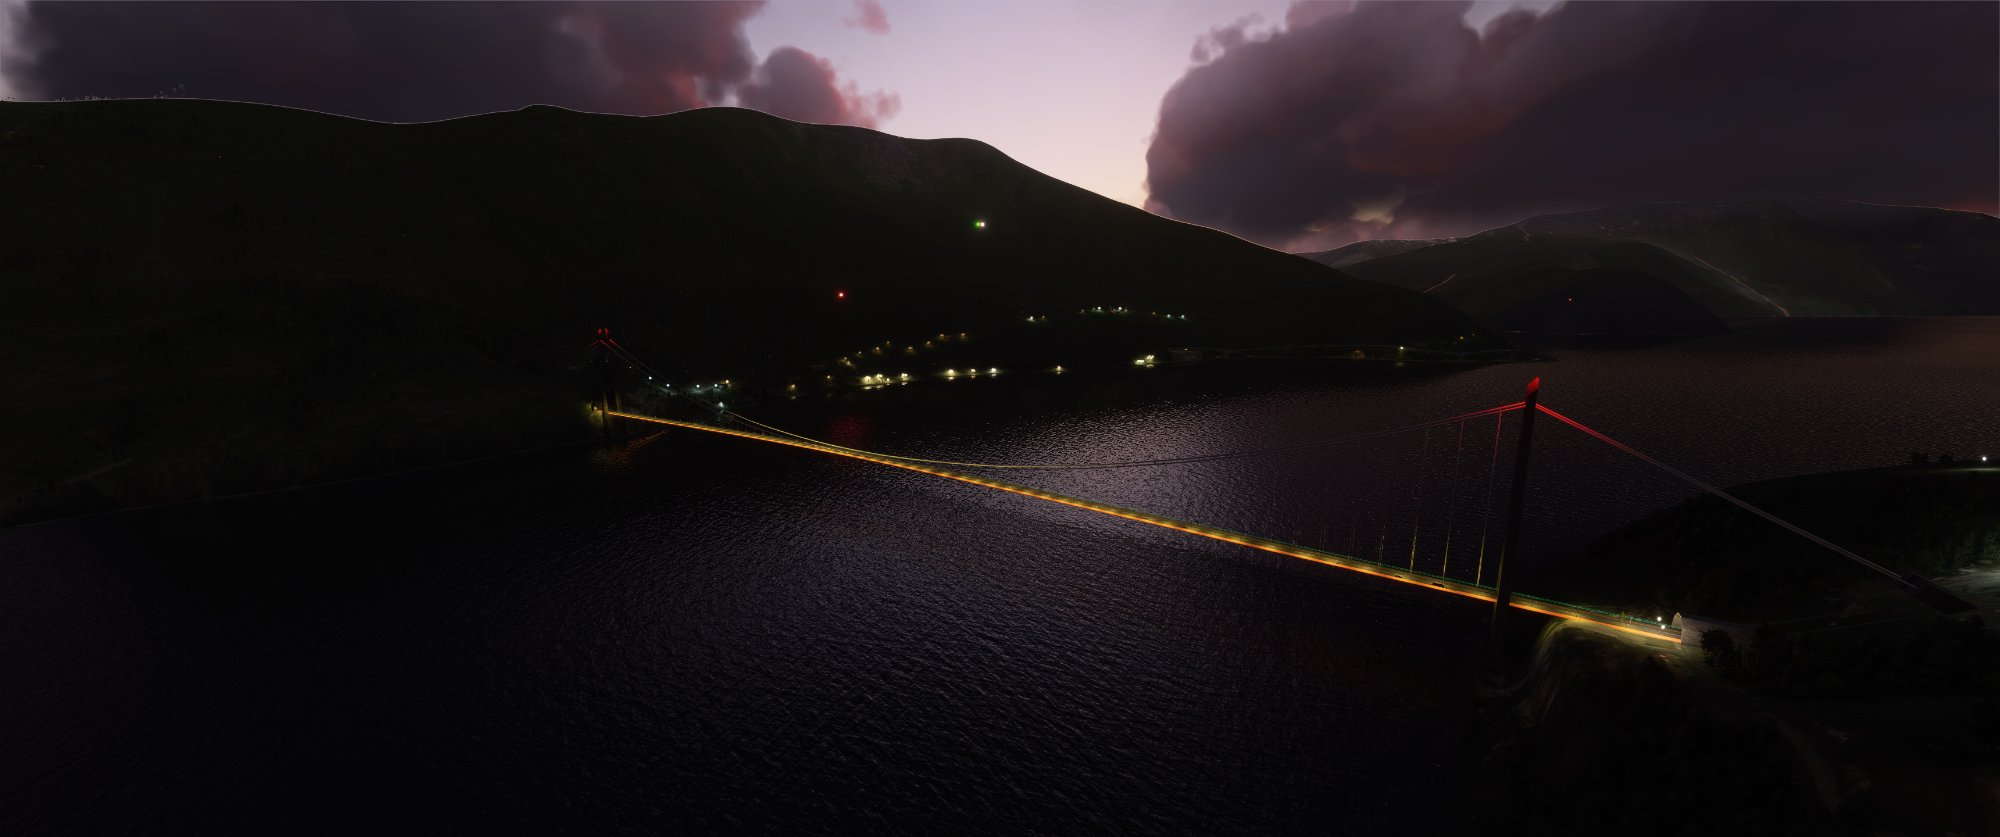 Microsoft Flight Simulator Screenshot 2021.02.28 - 09.47.33.92.jpg